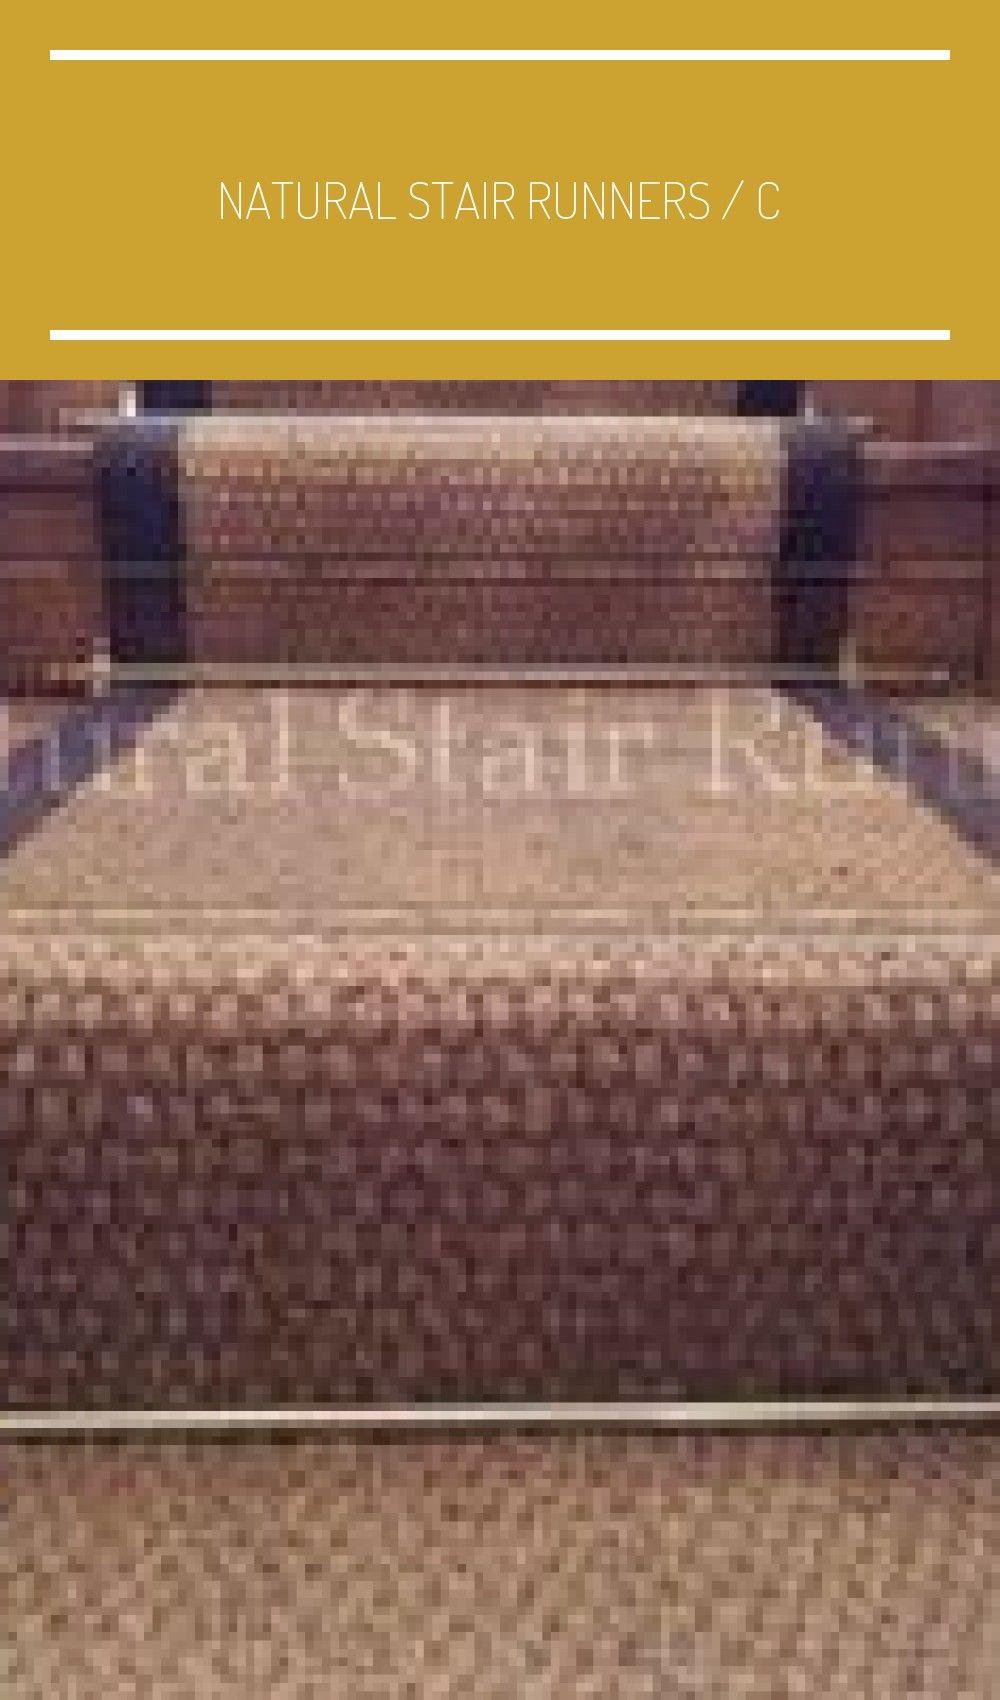 Best Natural Stair Runners Carpets Uk London Hessian Carpet Stairs In 2020 Carpet Stairs 400 x 300